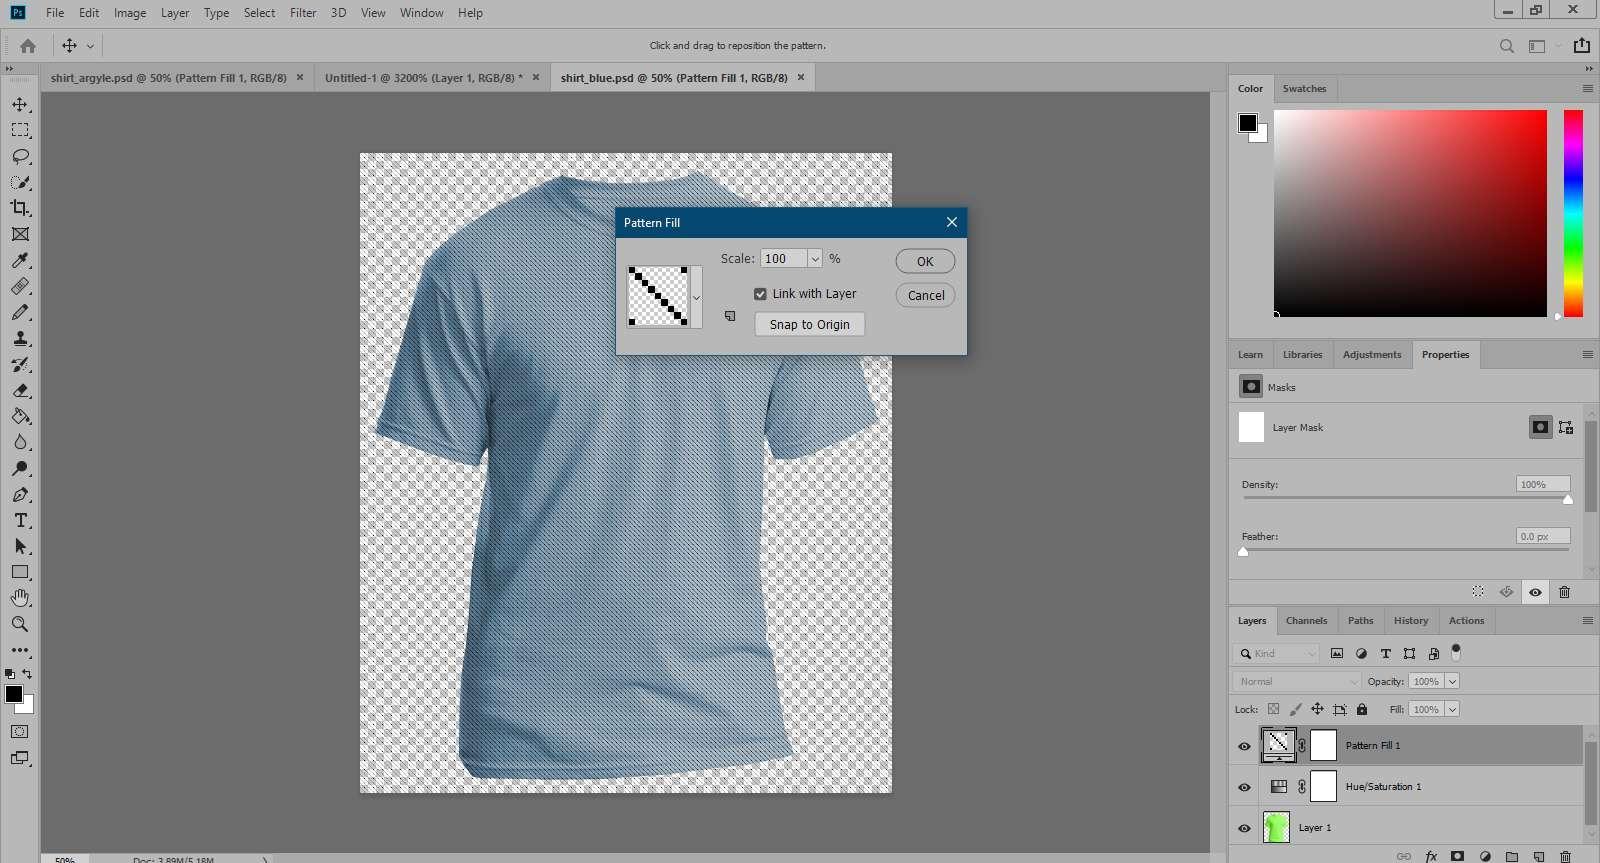 Applying the custom pattern in Photoshop.